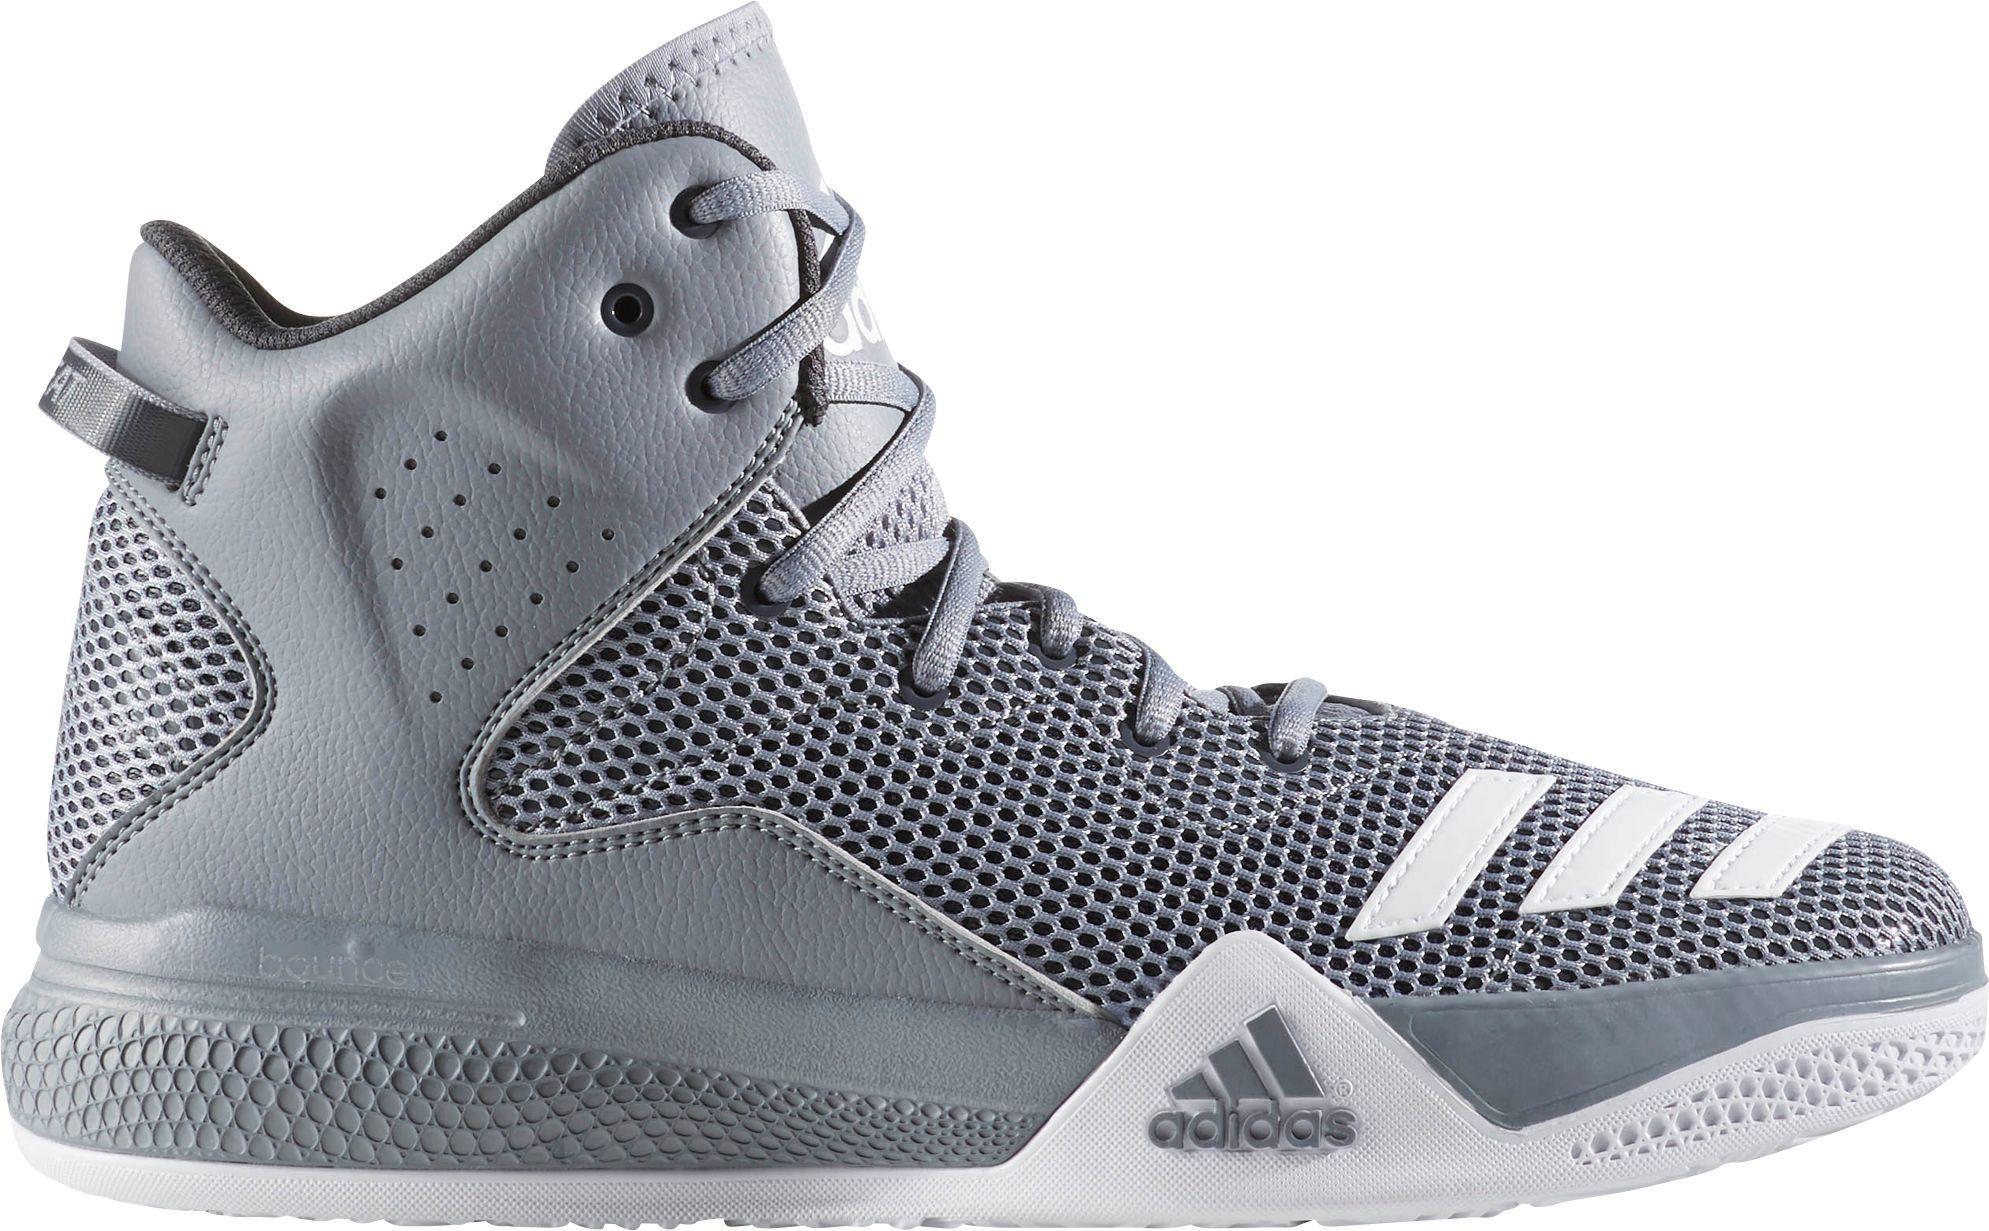 ... new zealand lyst adidas dual threat basketball shoes in gray for men  7fcdb fe494 9bfbd58cc